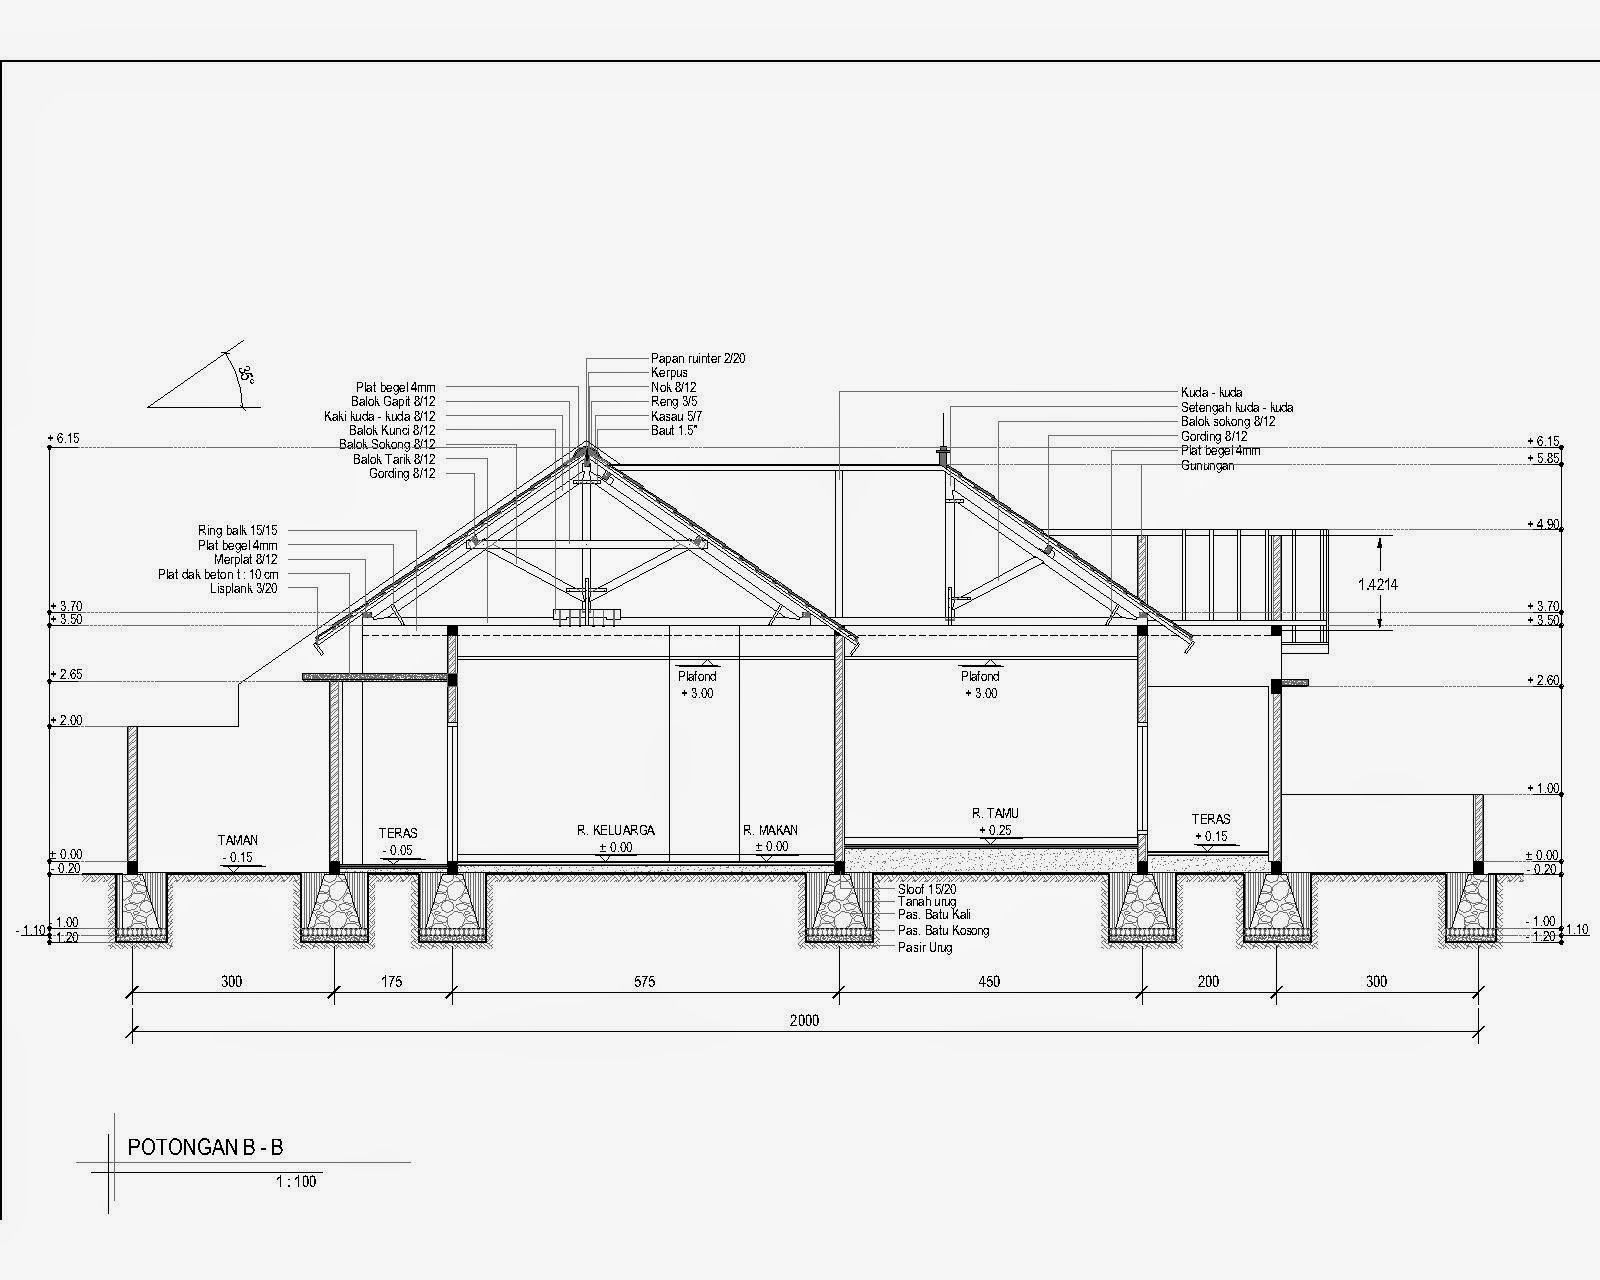 Contoh gambar potongan rumah minimalis menggunakan autocad design contoh gambar potongan rumah minimalis menggunakan autocad ccuart Gallery